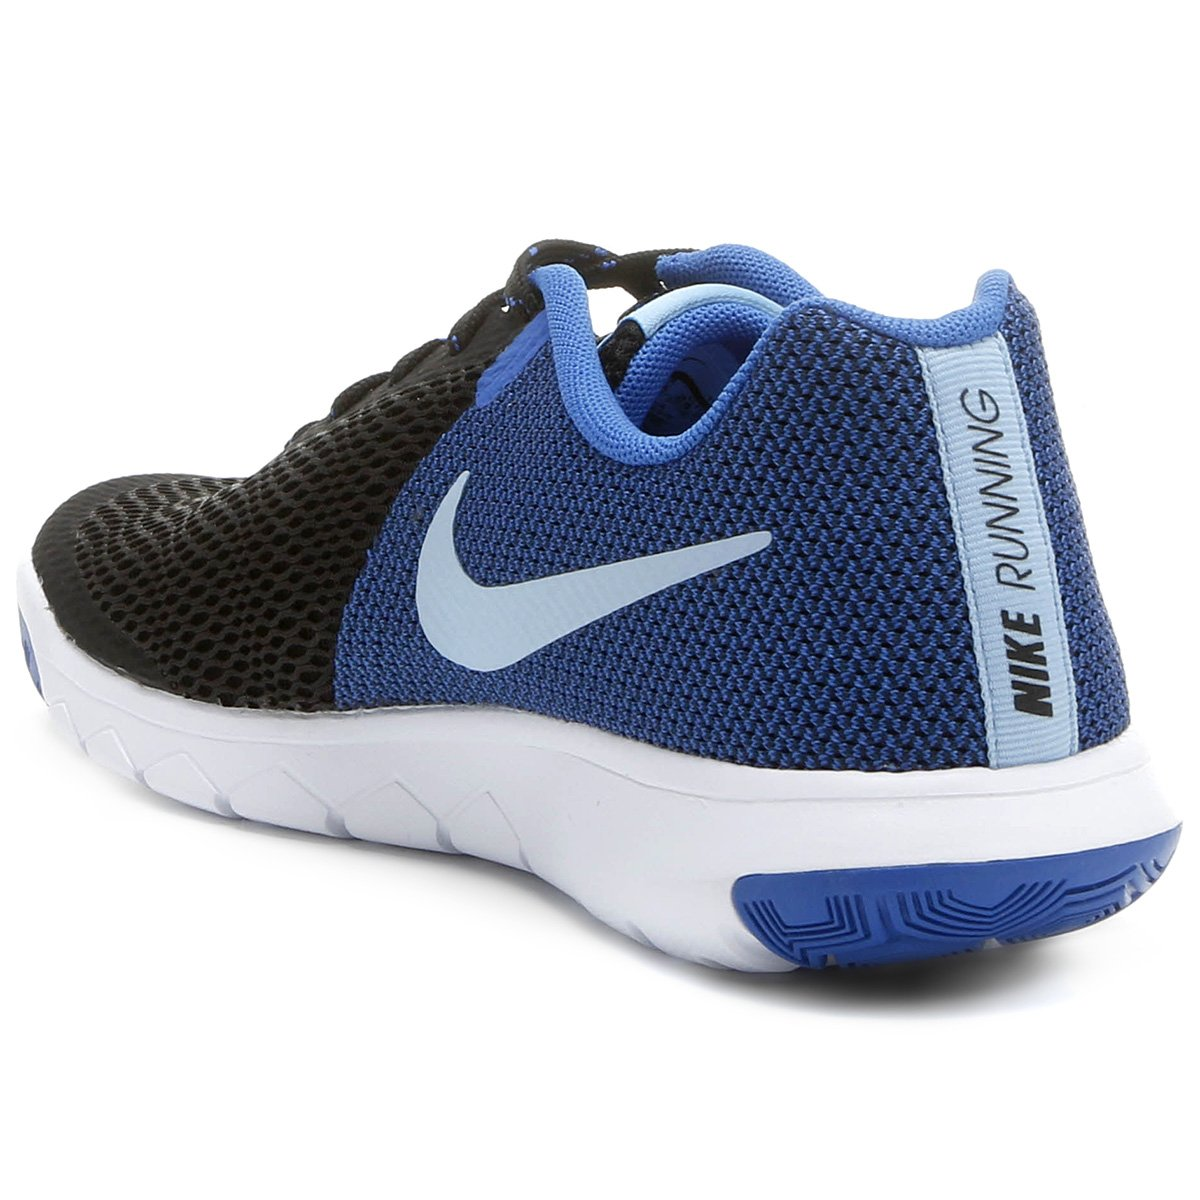 ceff11fe8a14e Tênis Nike Flex Experience Rn 5 Feminino